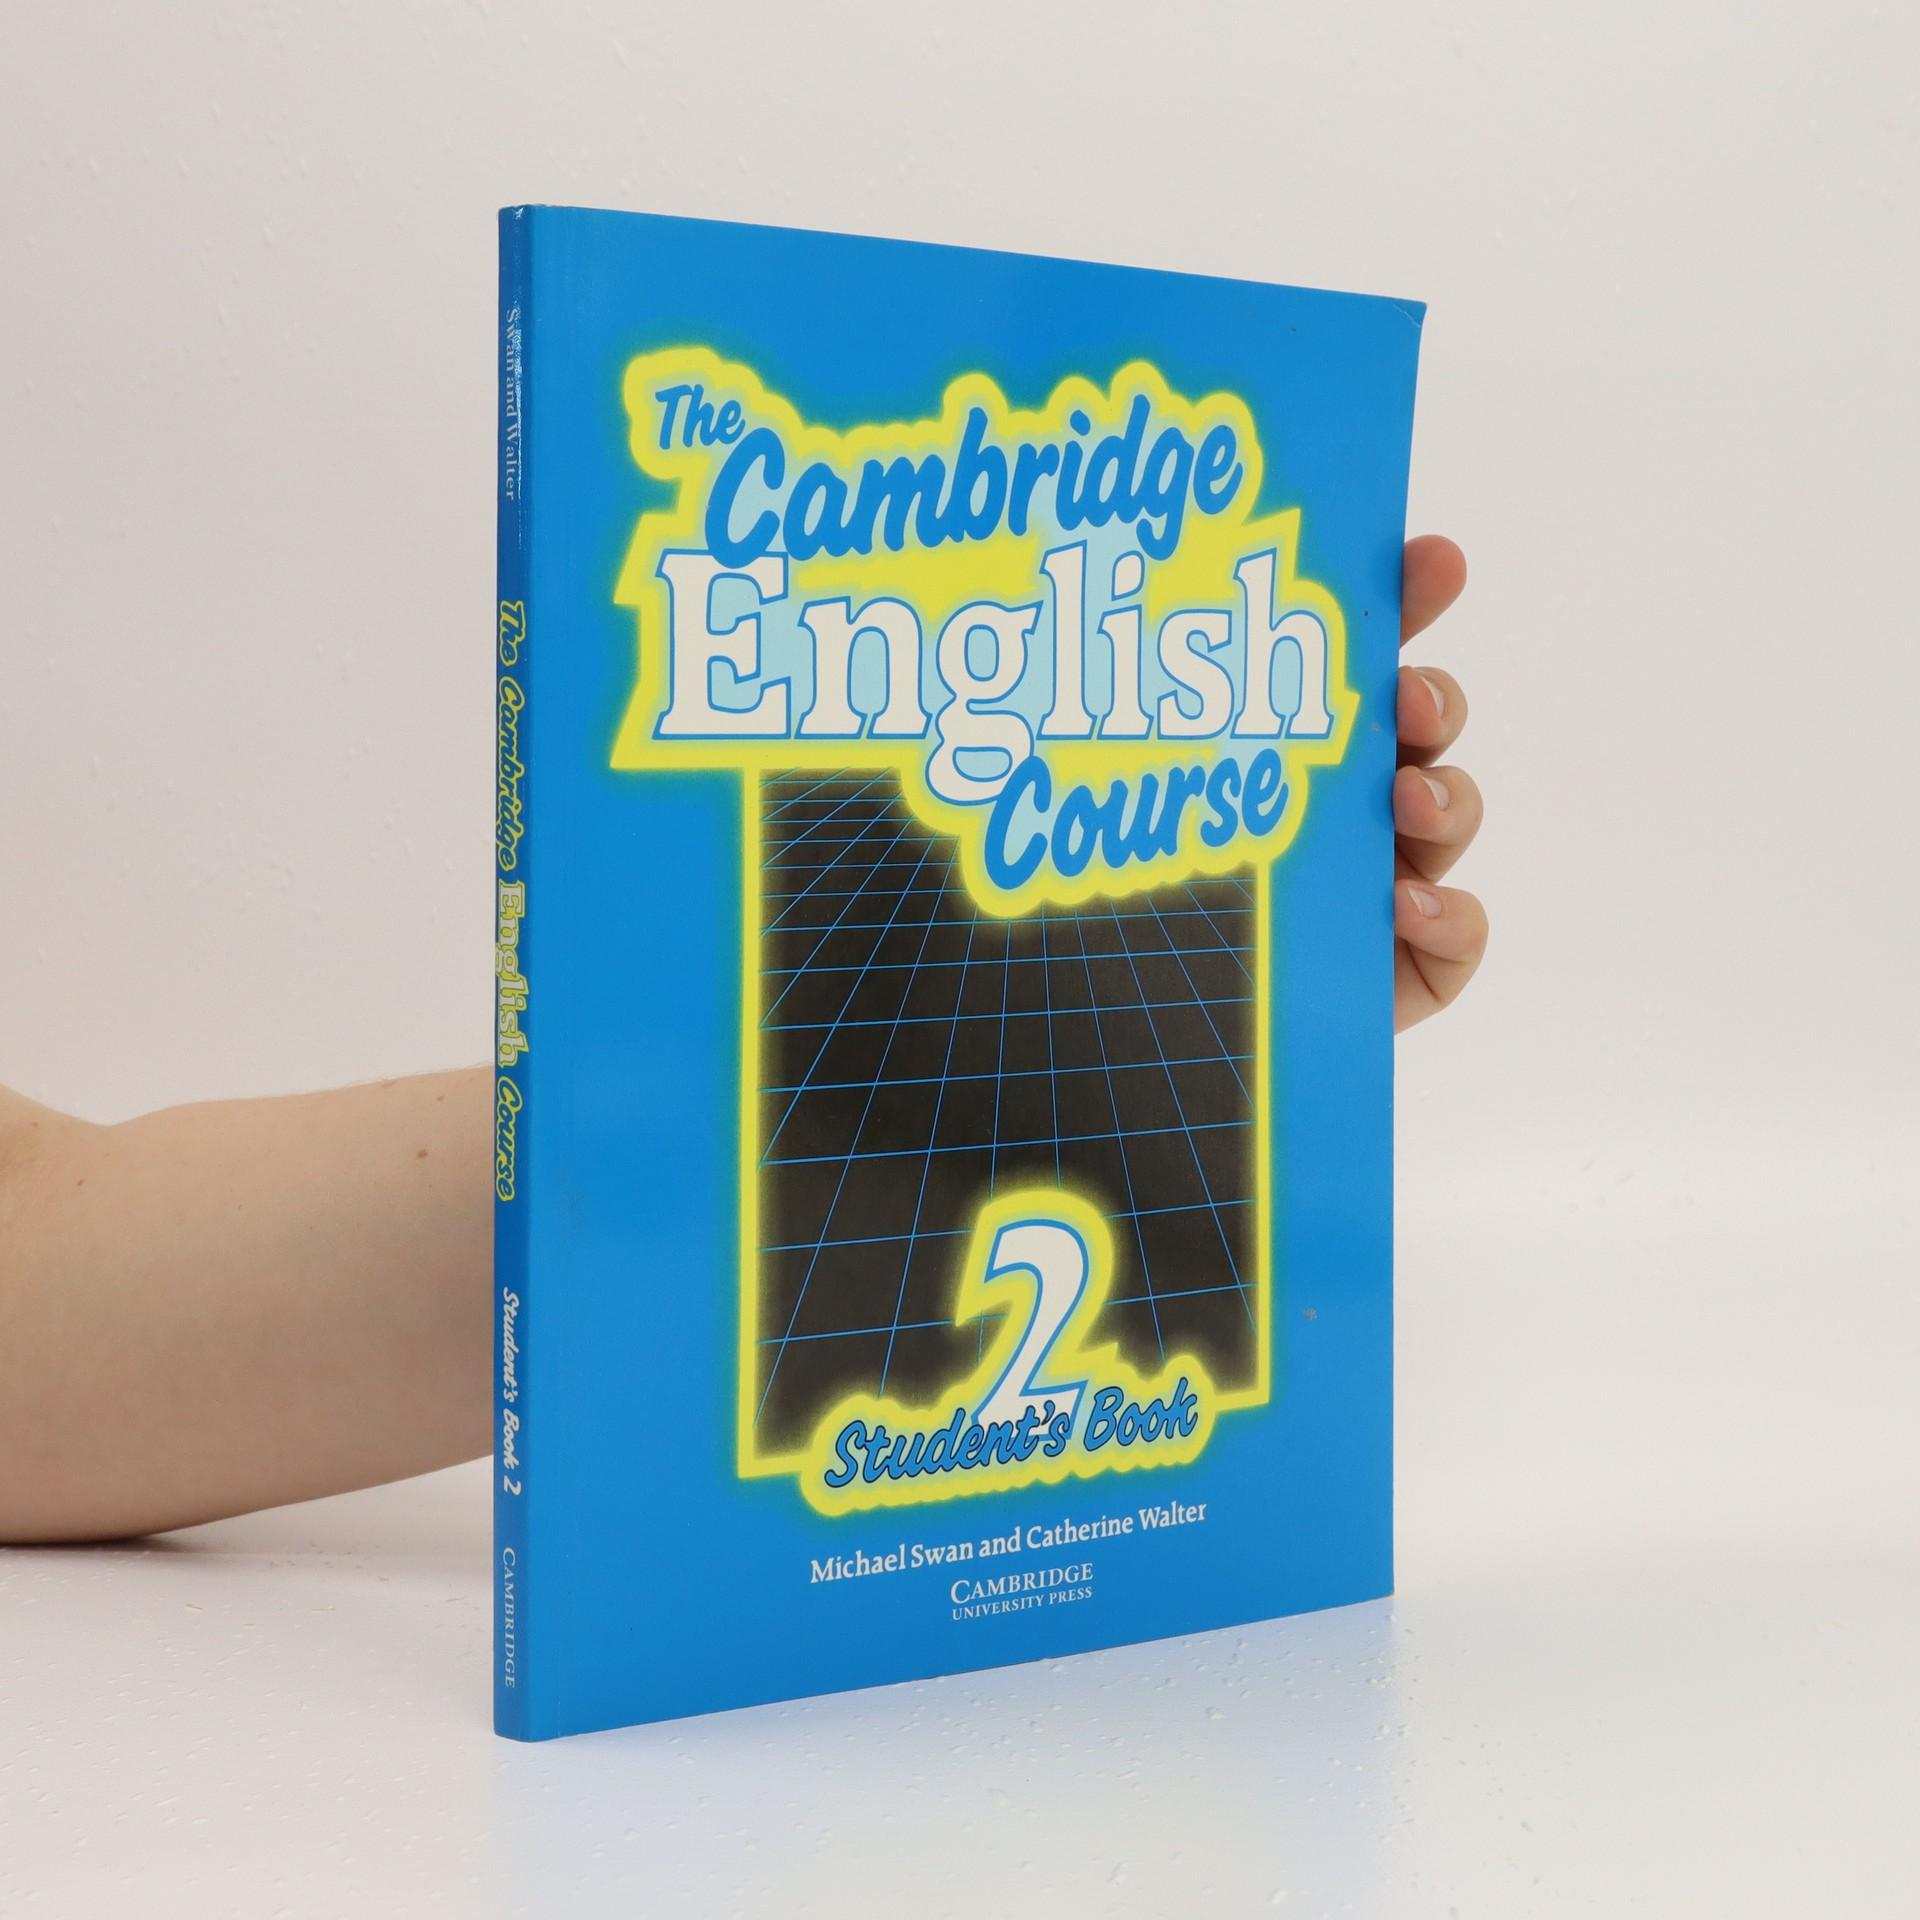 antikvární kniha The Cambridge English course 2 : student's book, 1995